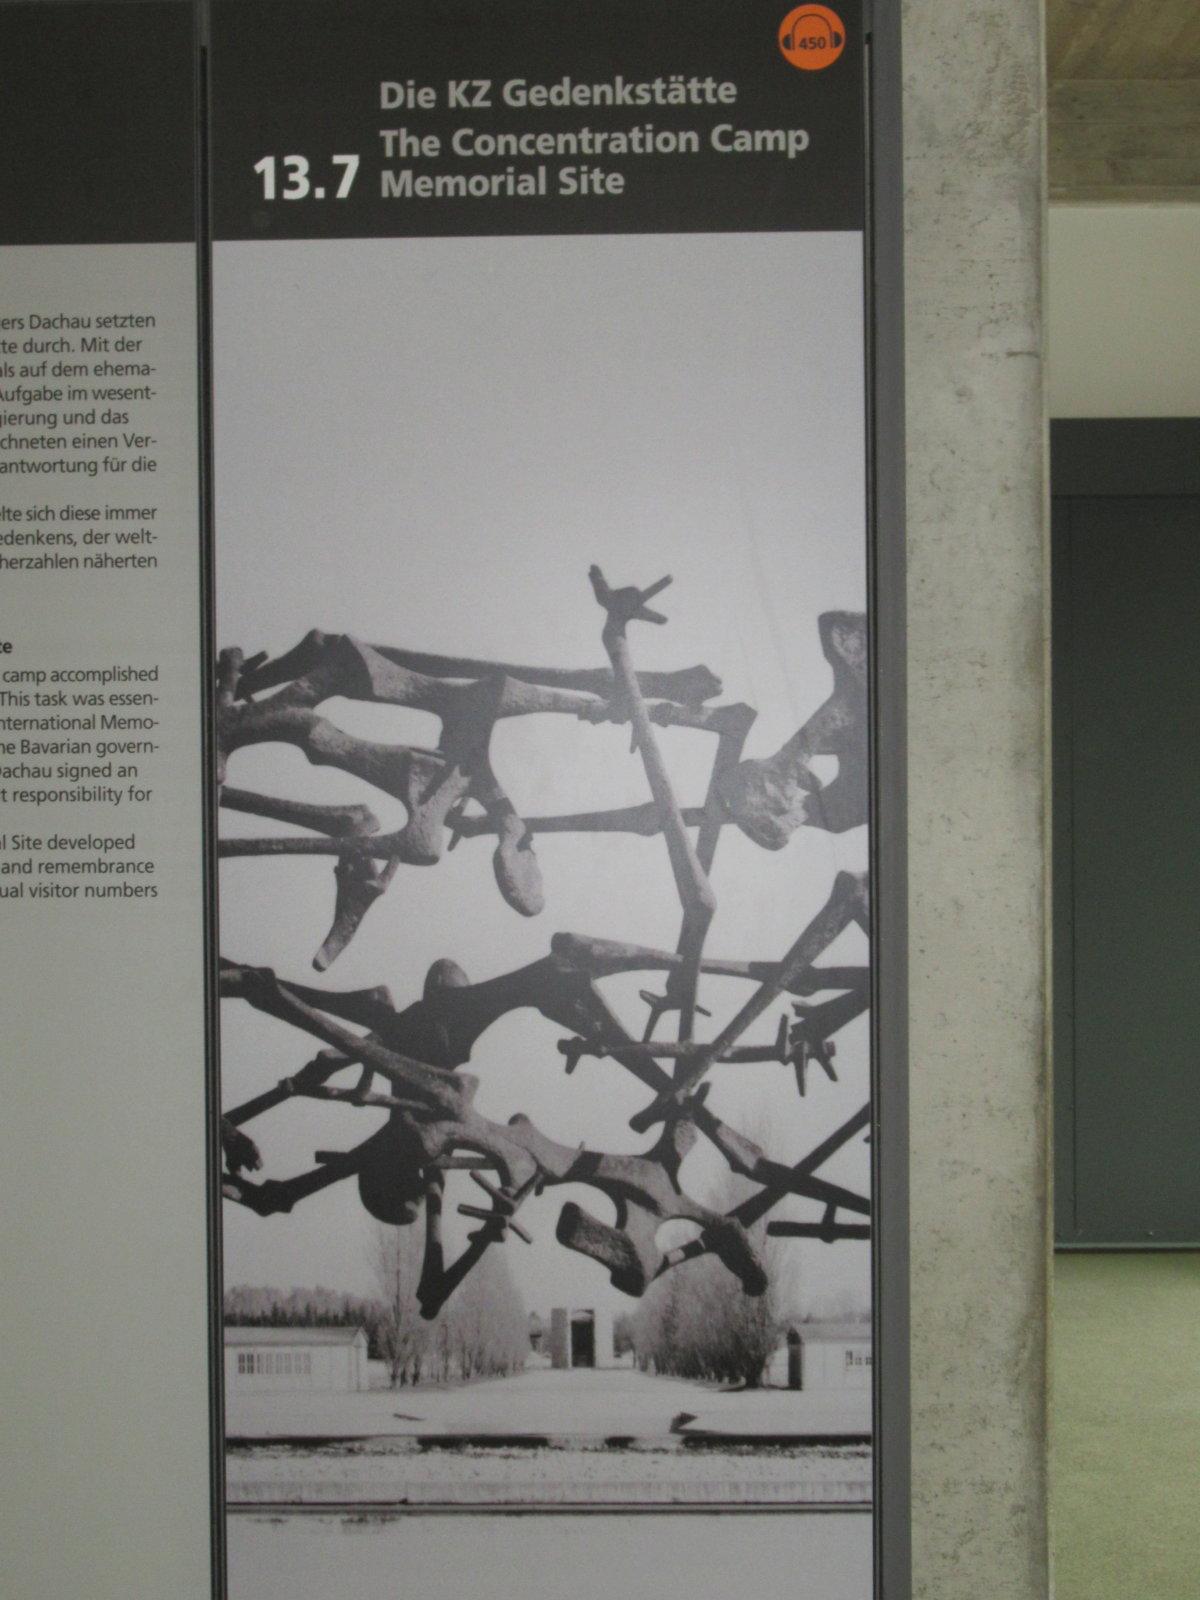 07-29 Dachu Stories 5